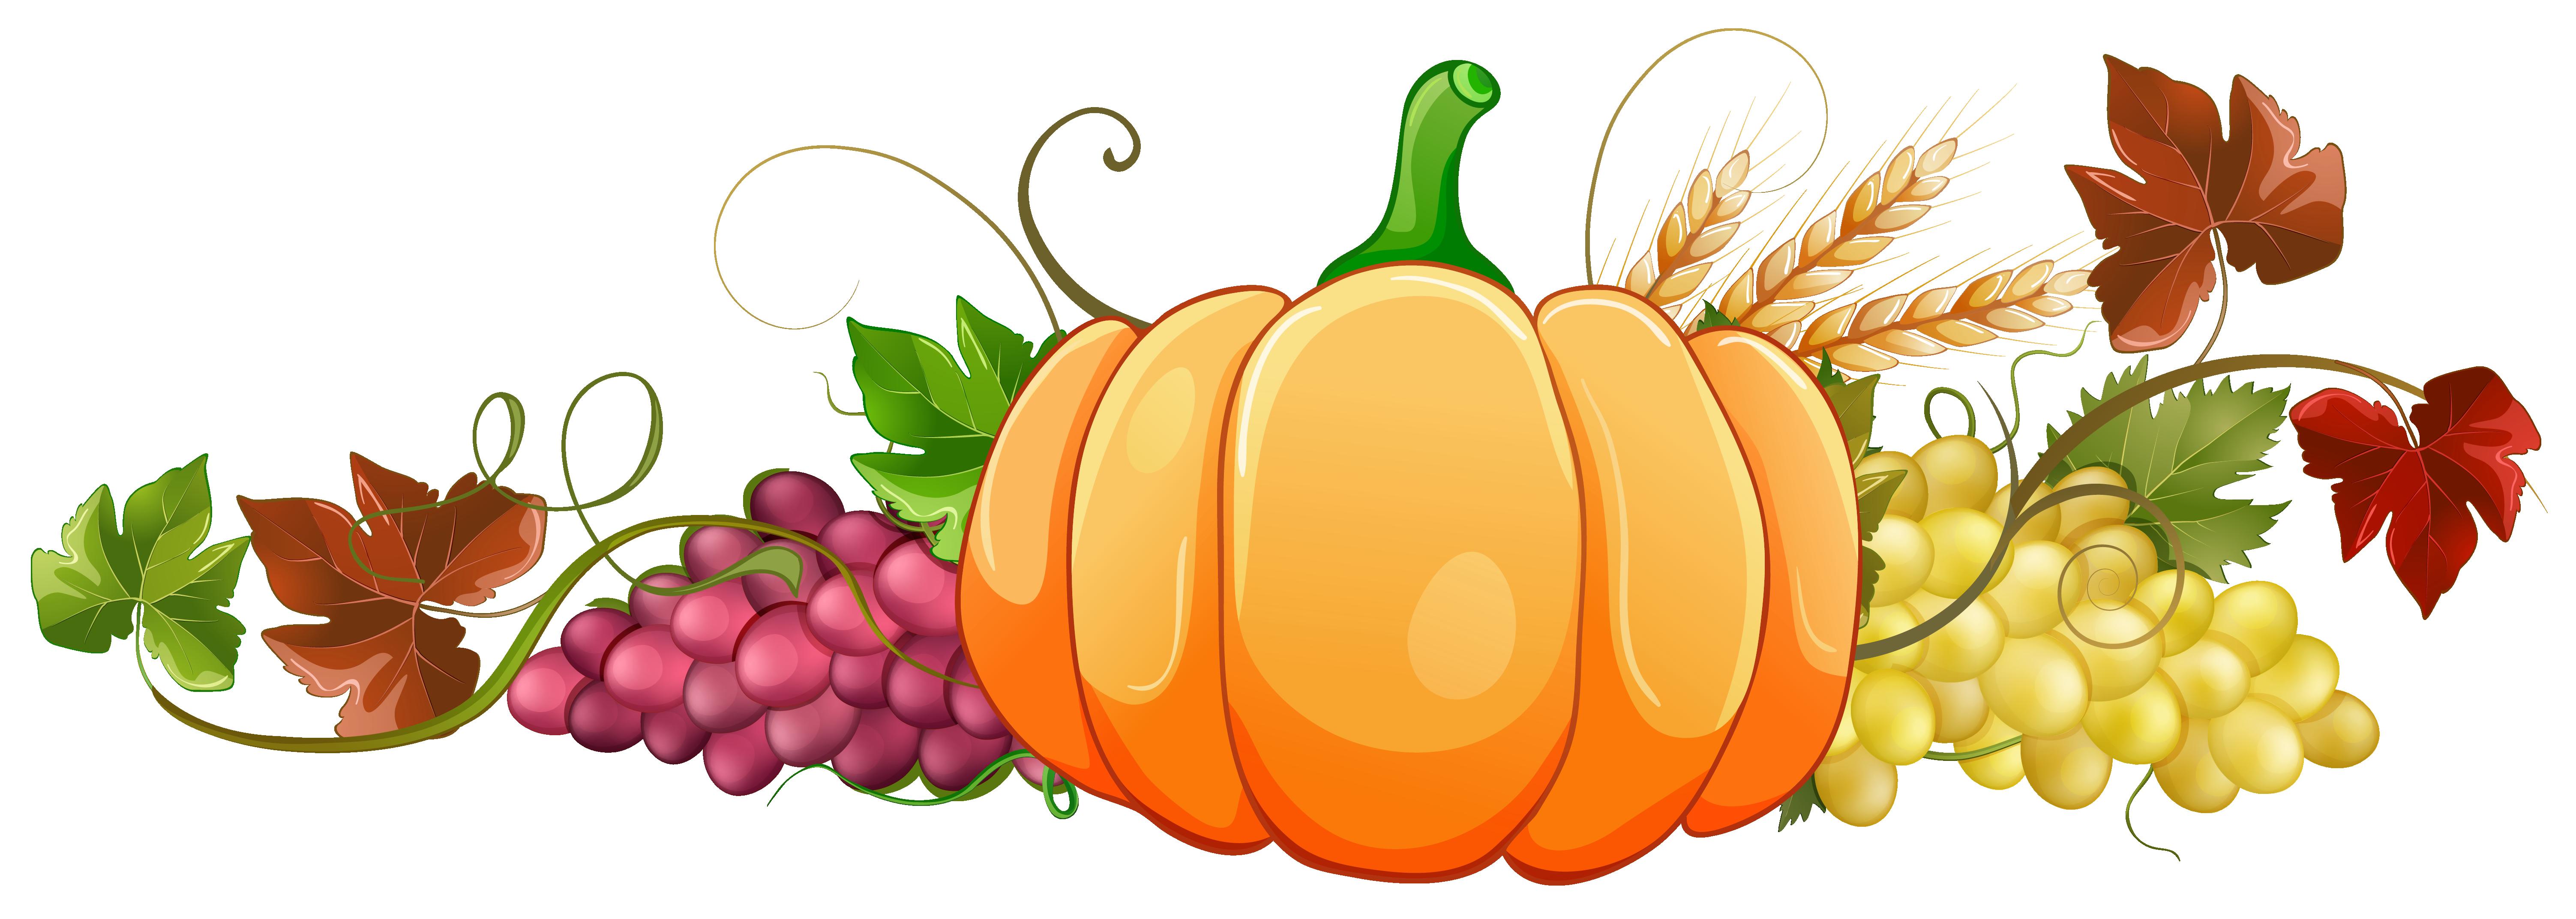 Fall pumpkin clipart.